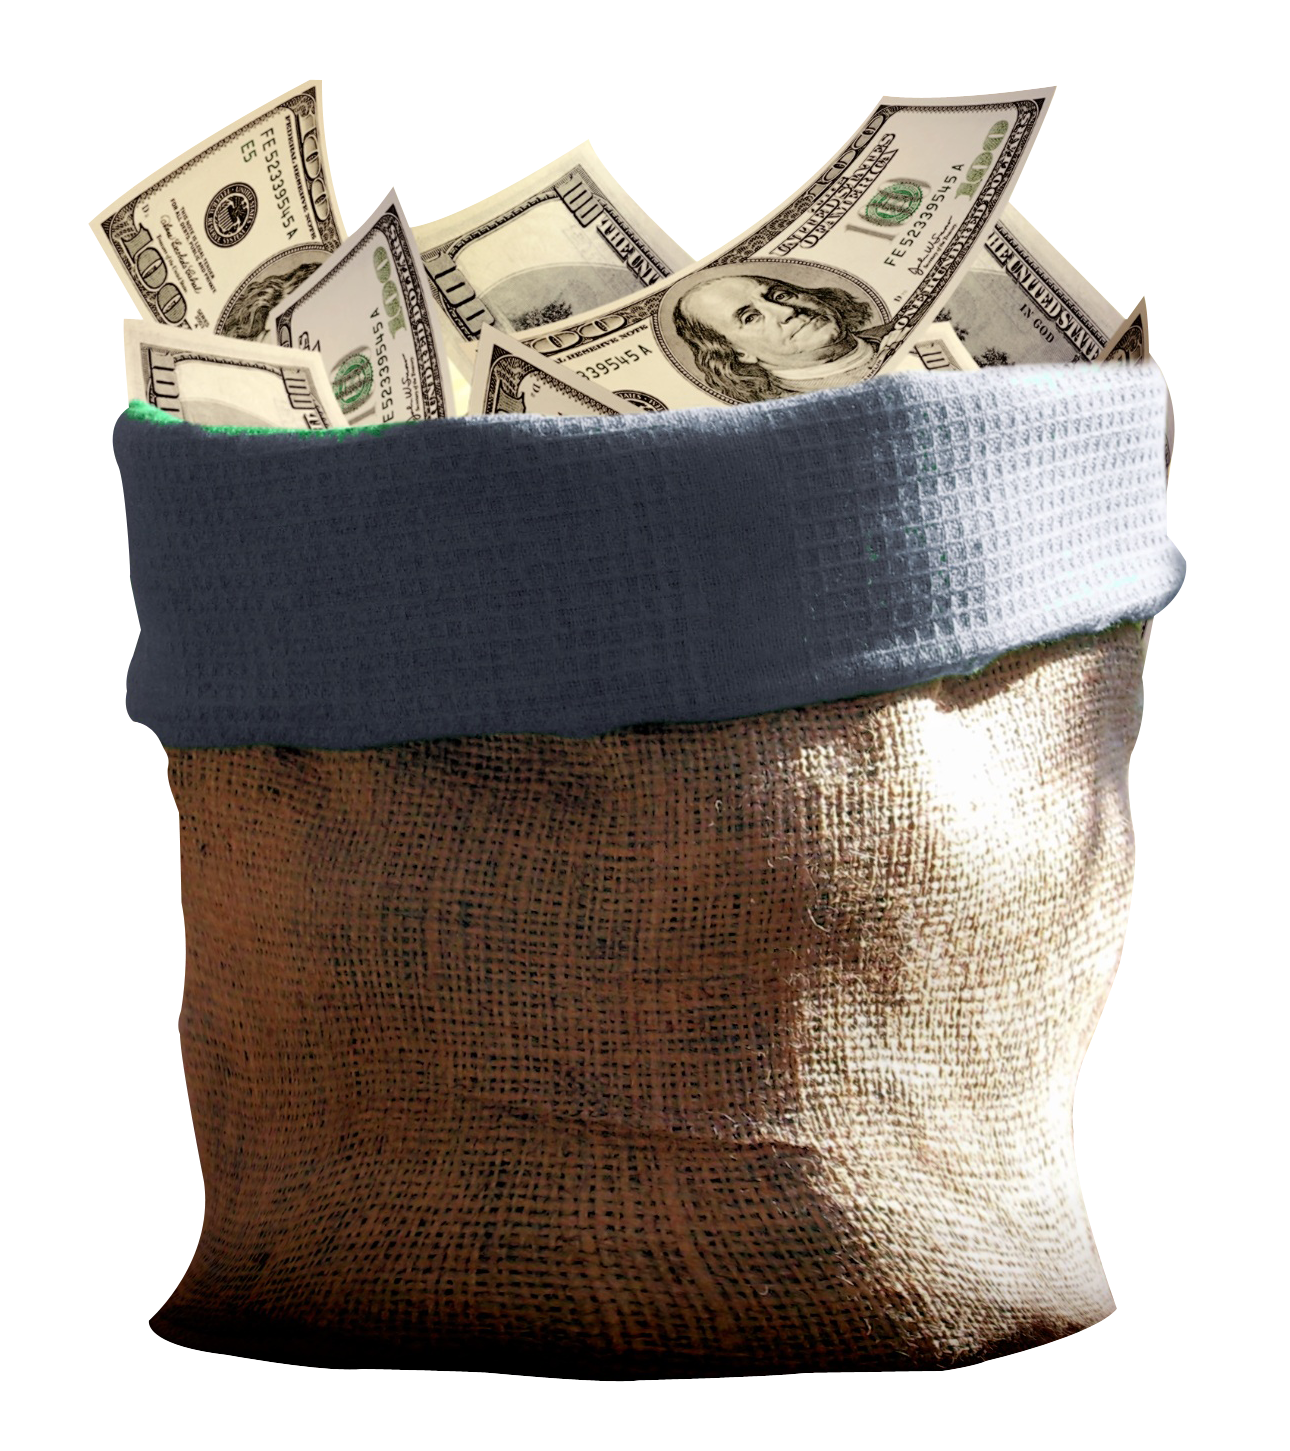 Bag of money png. Image purepng free transparent